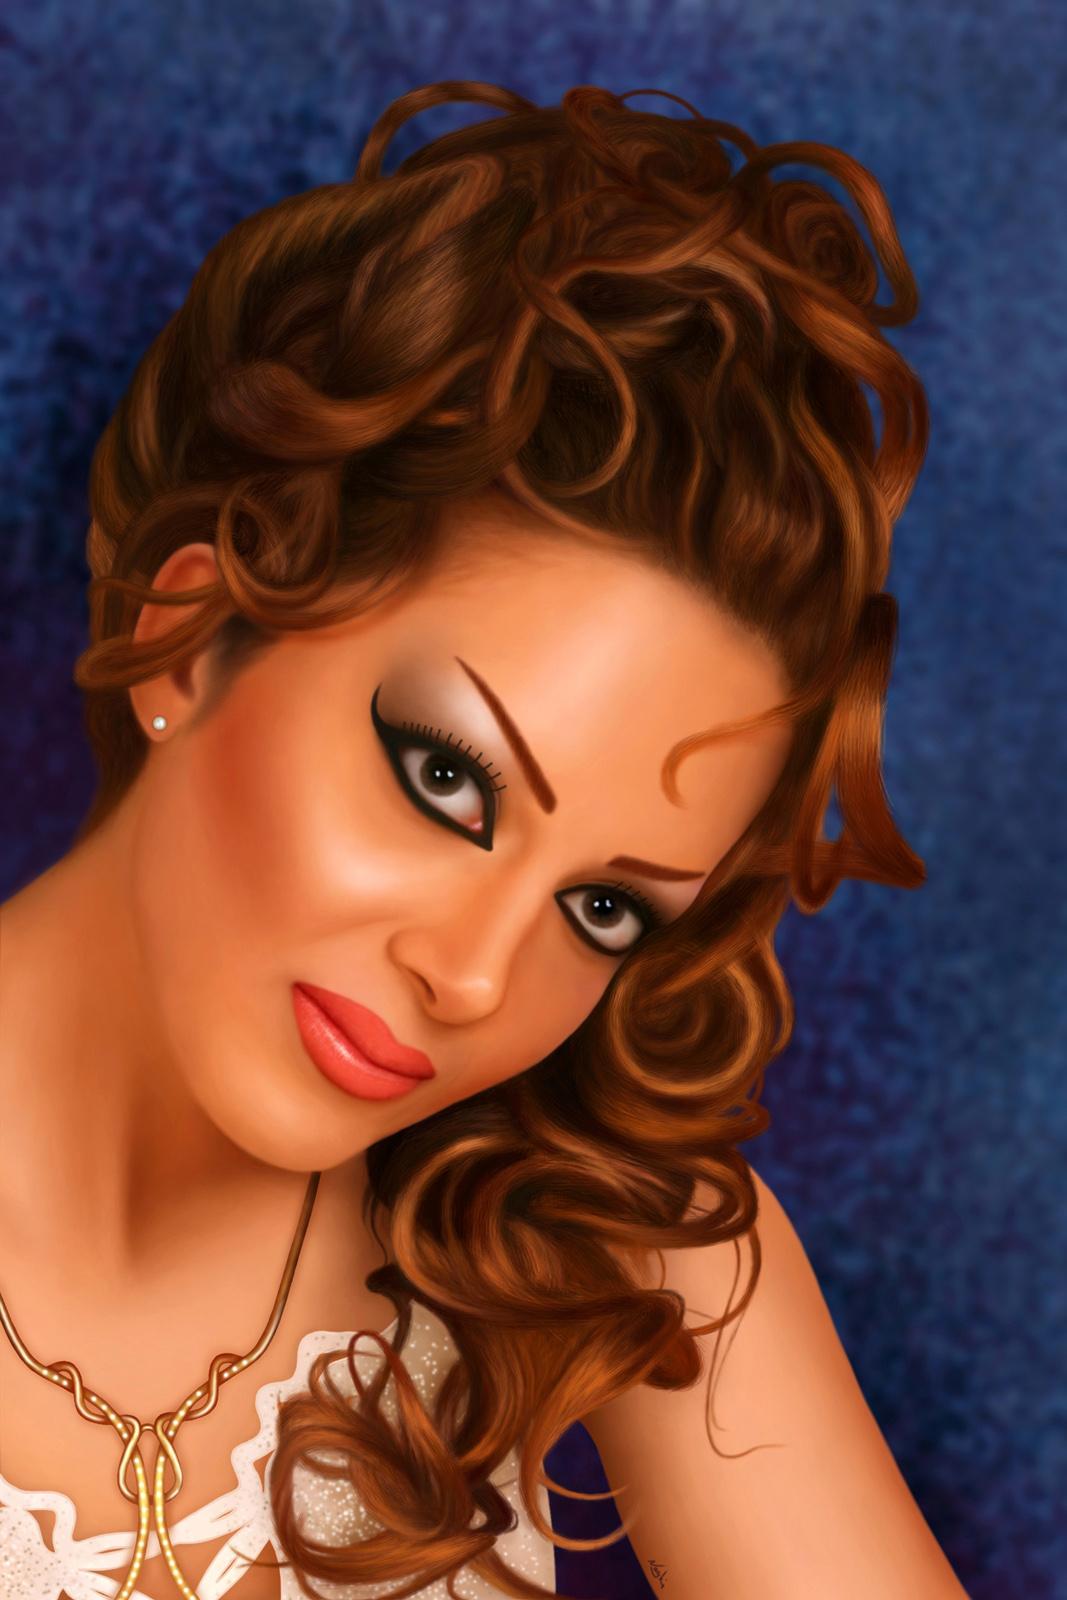 Naghi woman 1 c1baec0b gq9x